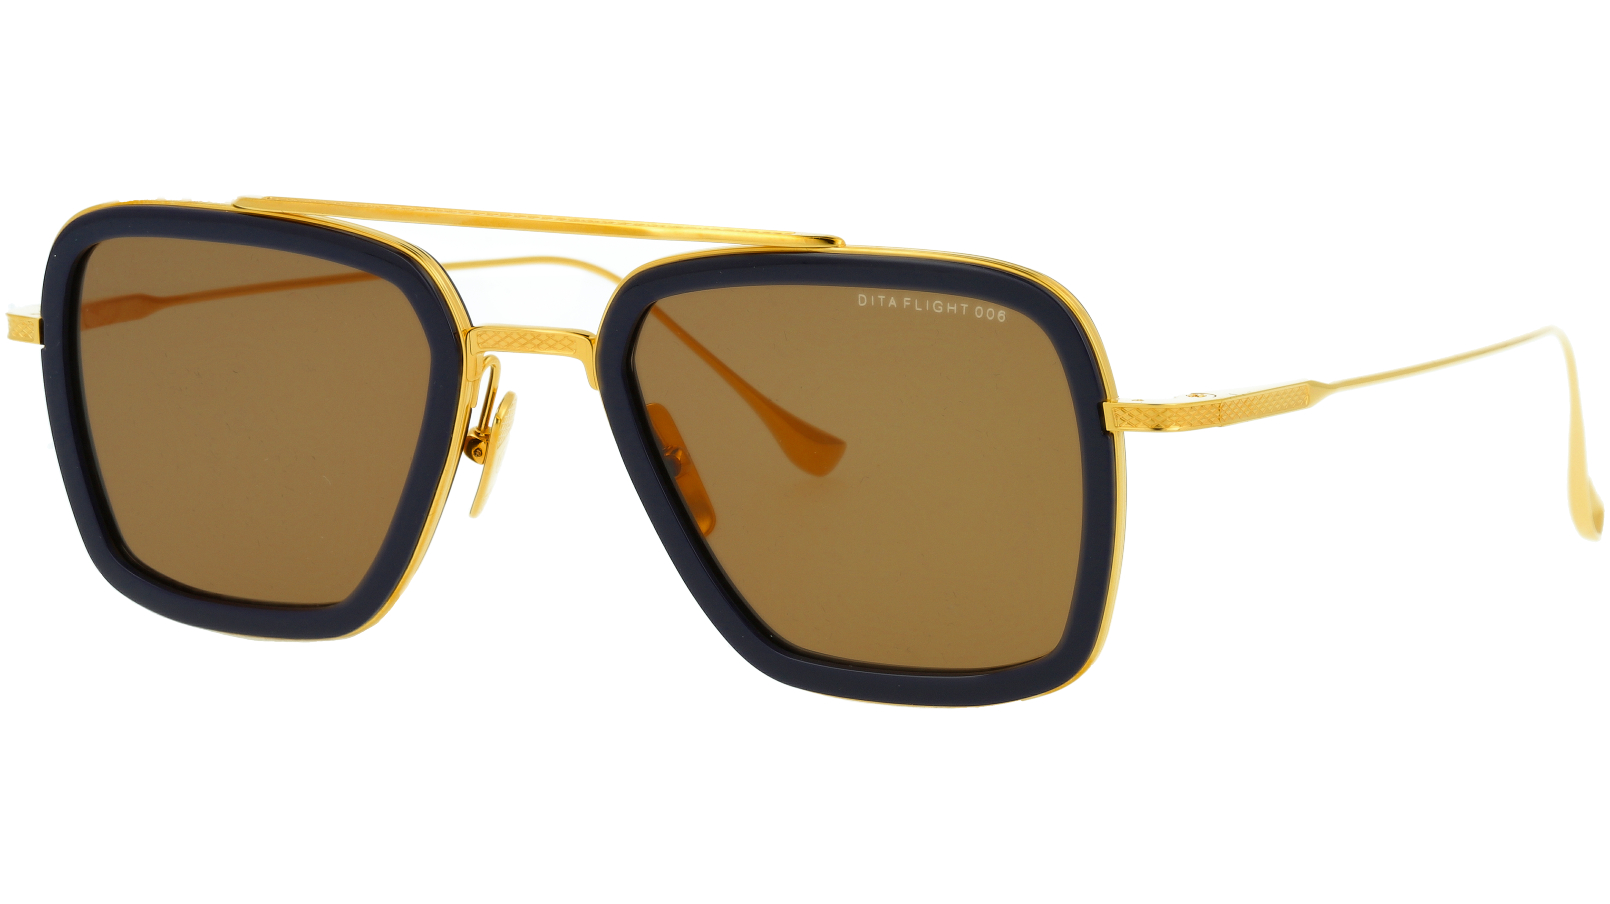 DITA FLIGHT.006 DRX7806 C-GREY 52 GOLD Sunglasses